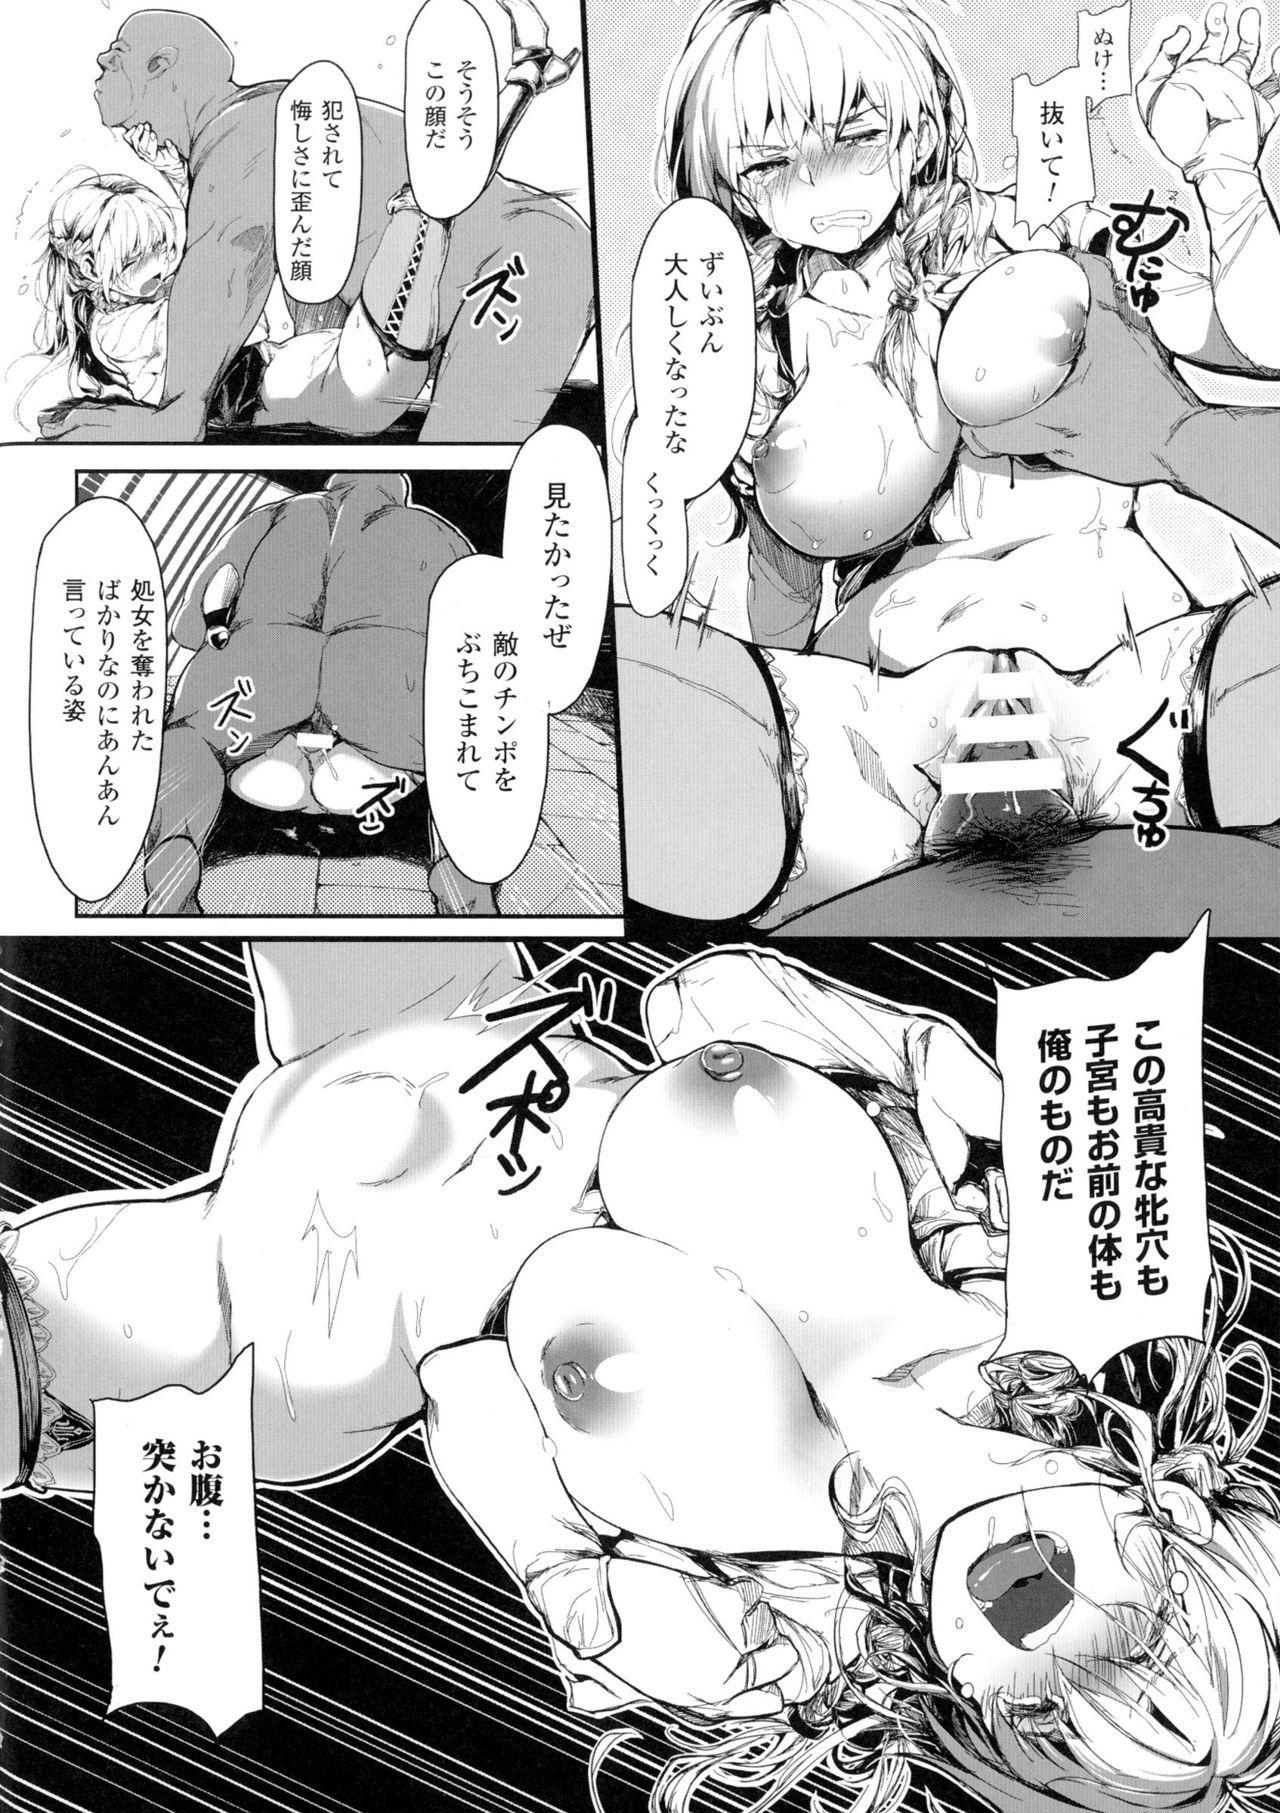 Seigi no Heroine Kangoku File DX Vol. 1 62